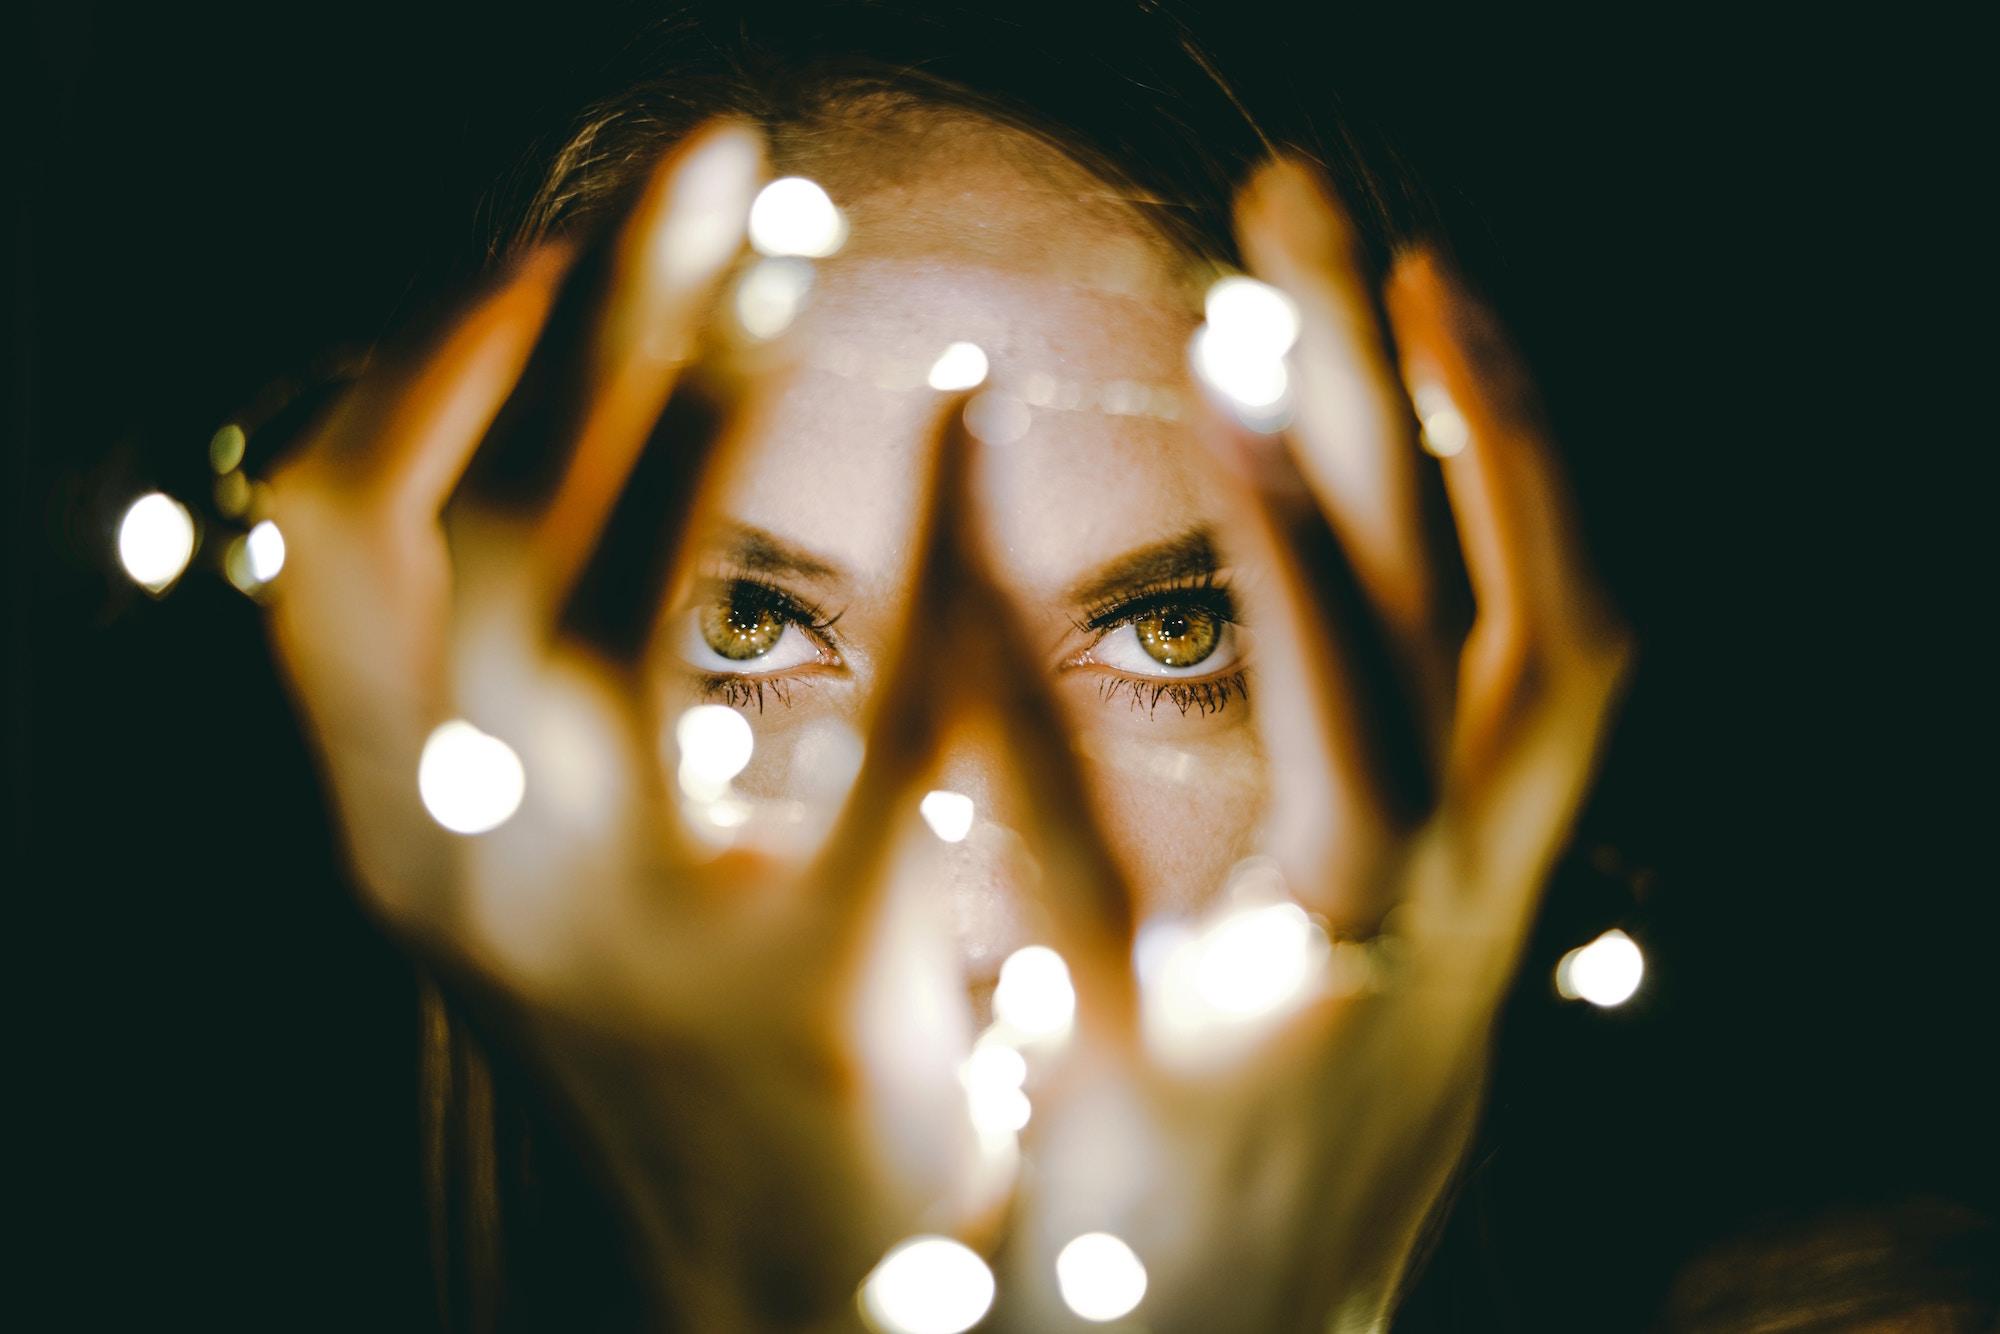 rhett-wesley-Mente-Mirada Meditacion.jpg